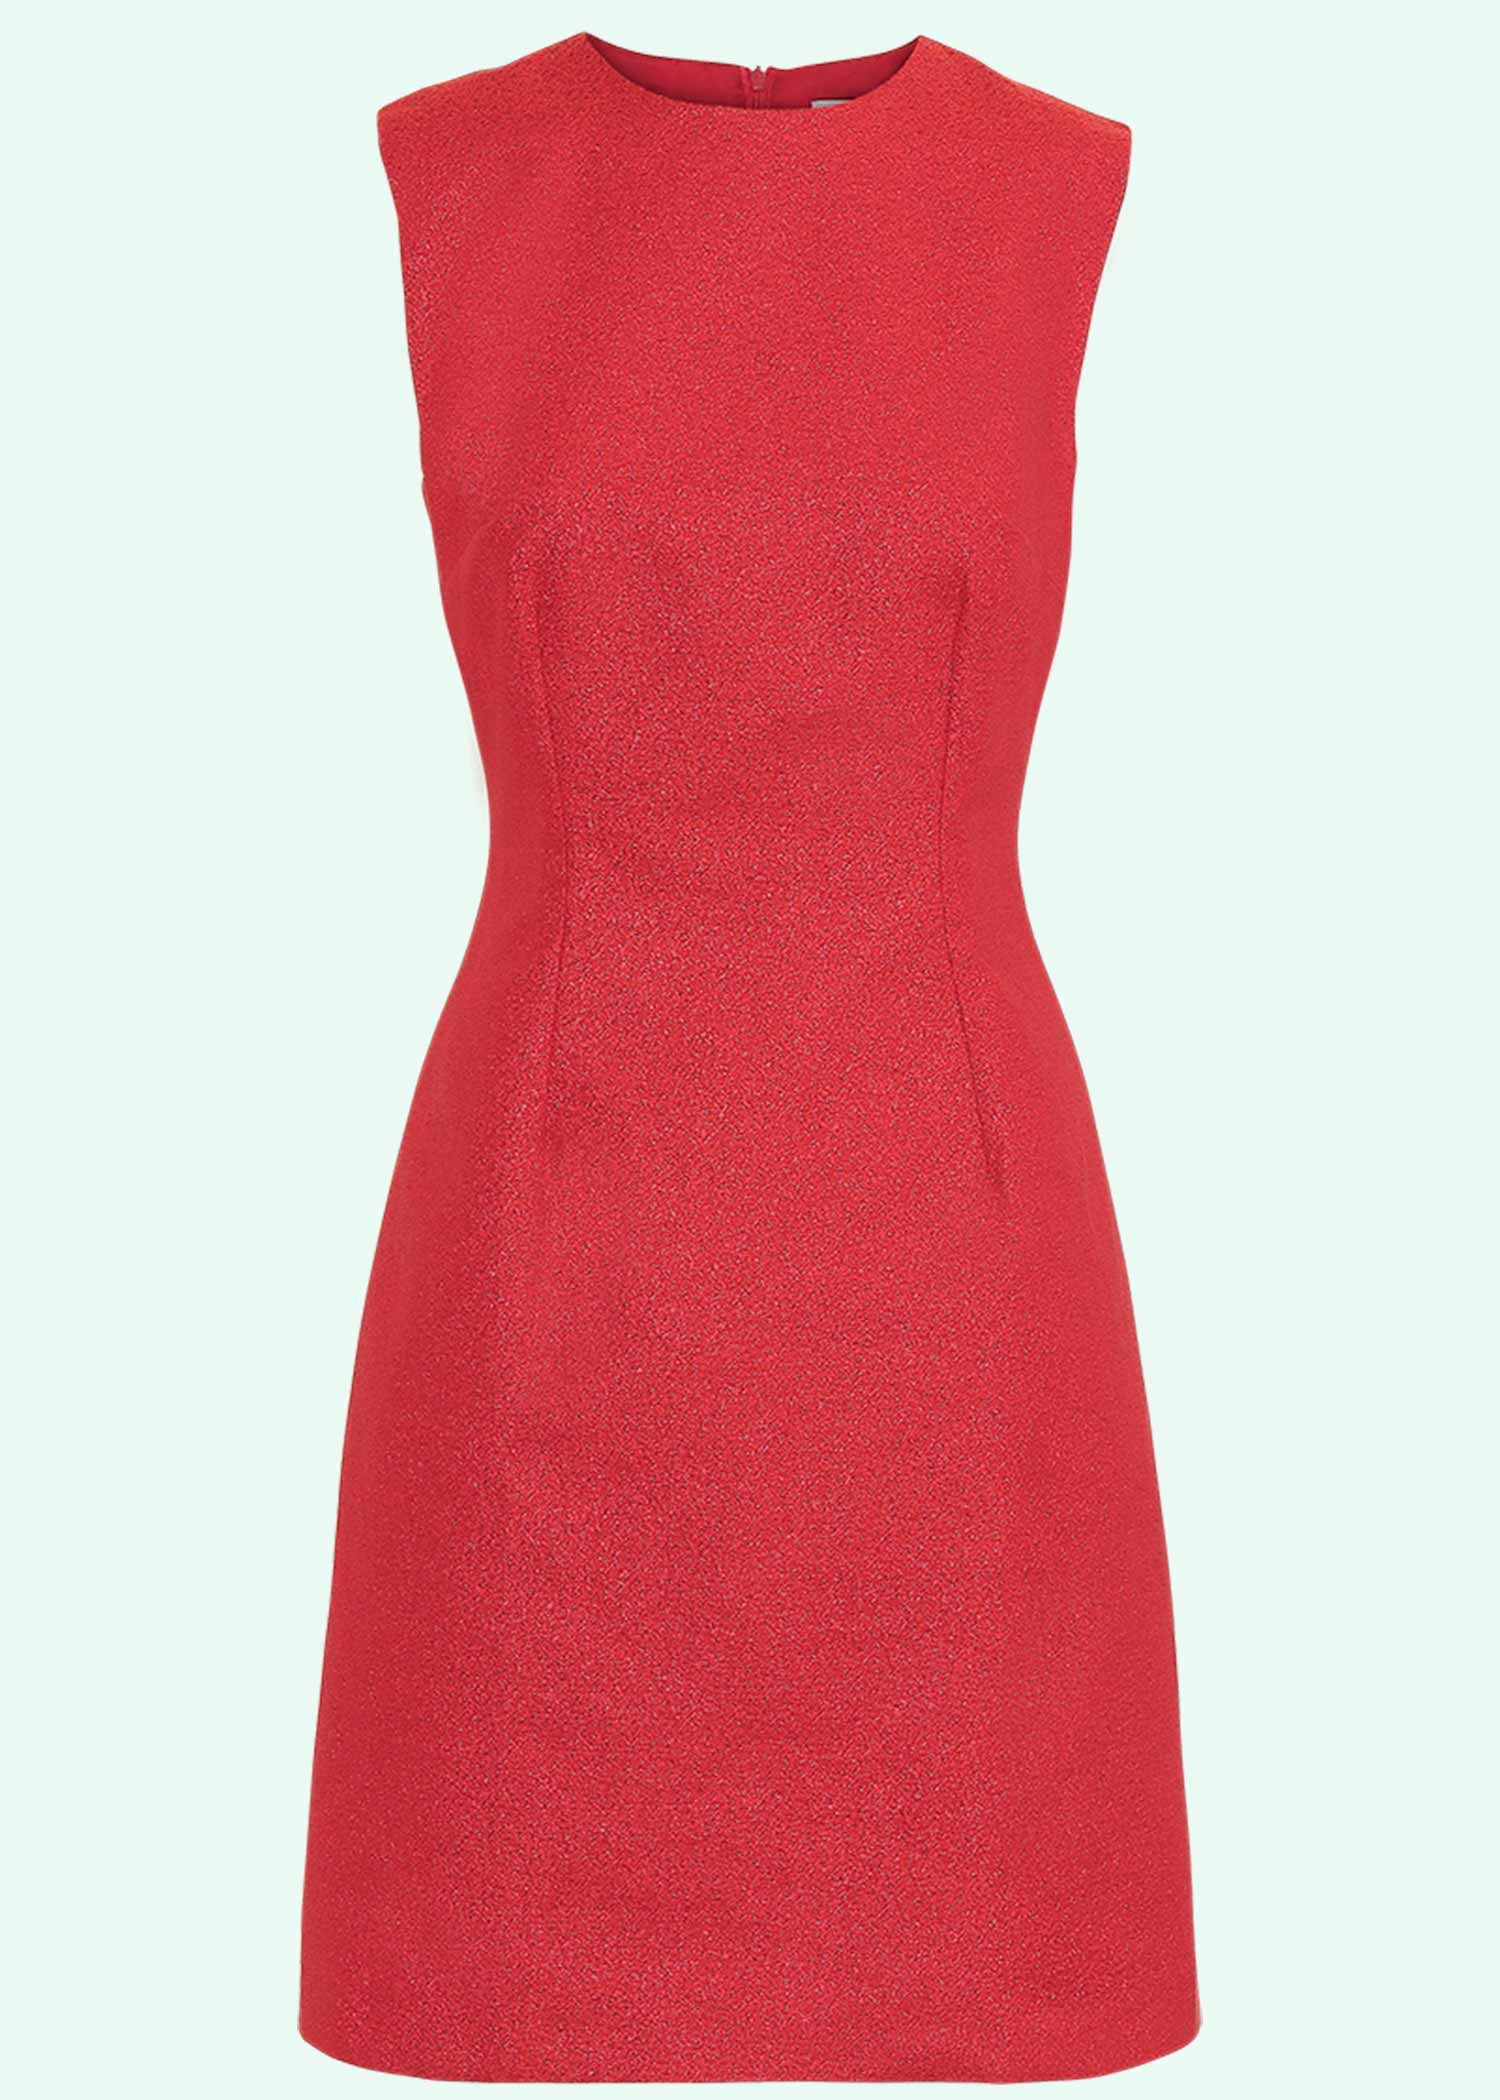 60s Mini dress in red glitter from Marmalade